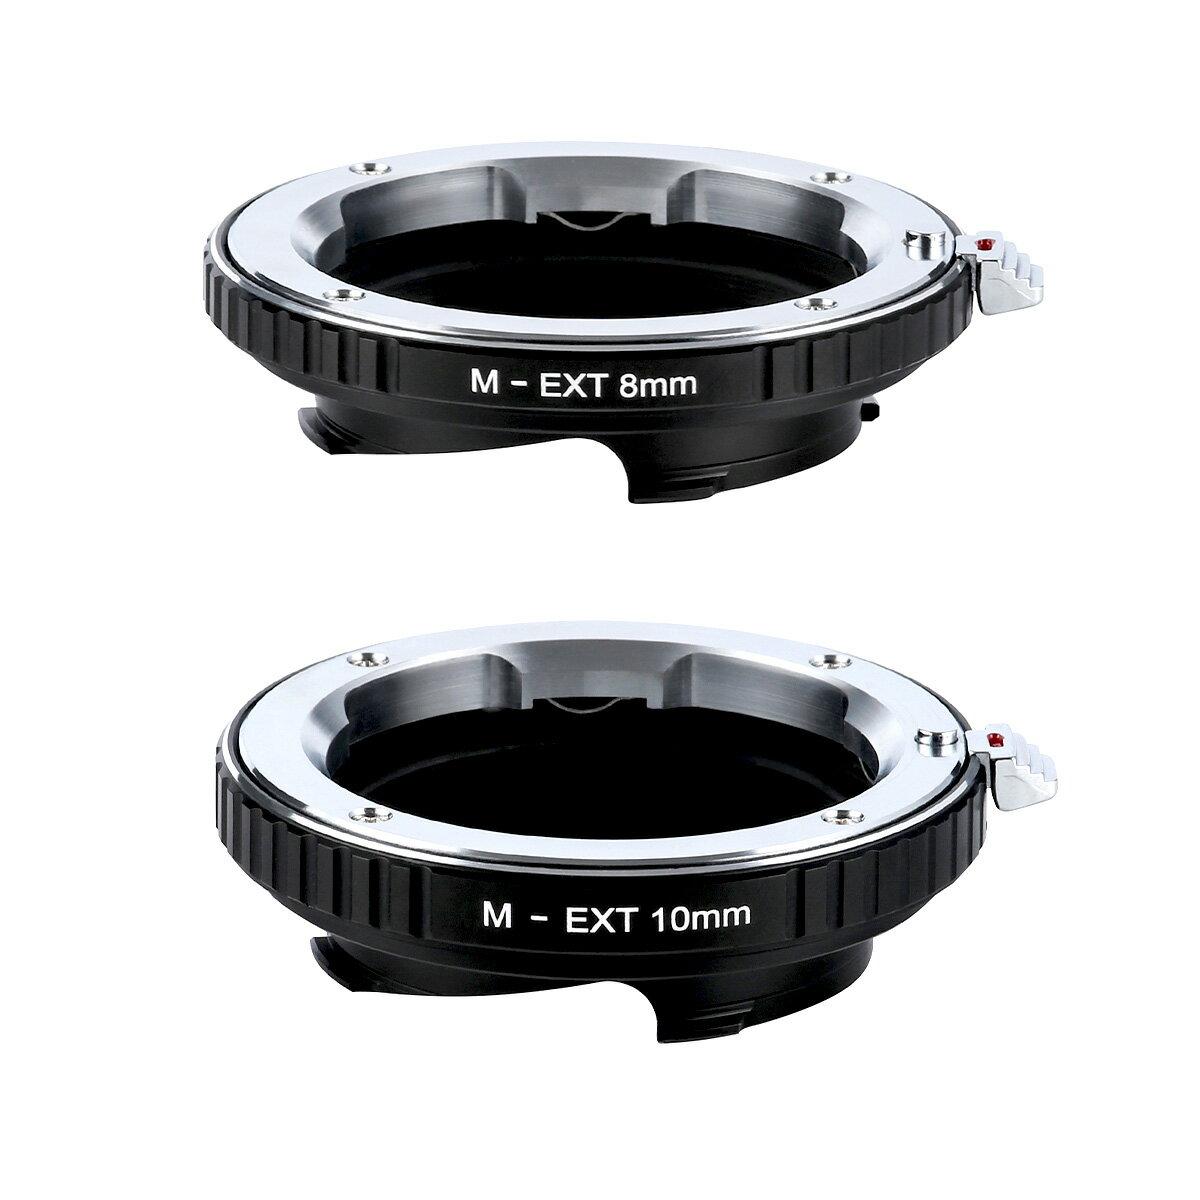 K&F Concept レンズマウントアダプター KF-MM8/10 (ライカMマウント接写リングセット) 8mm / 10mm